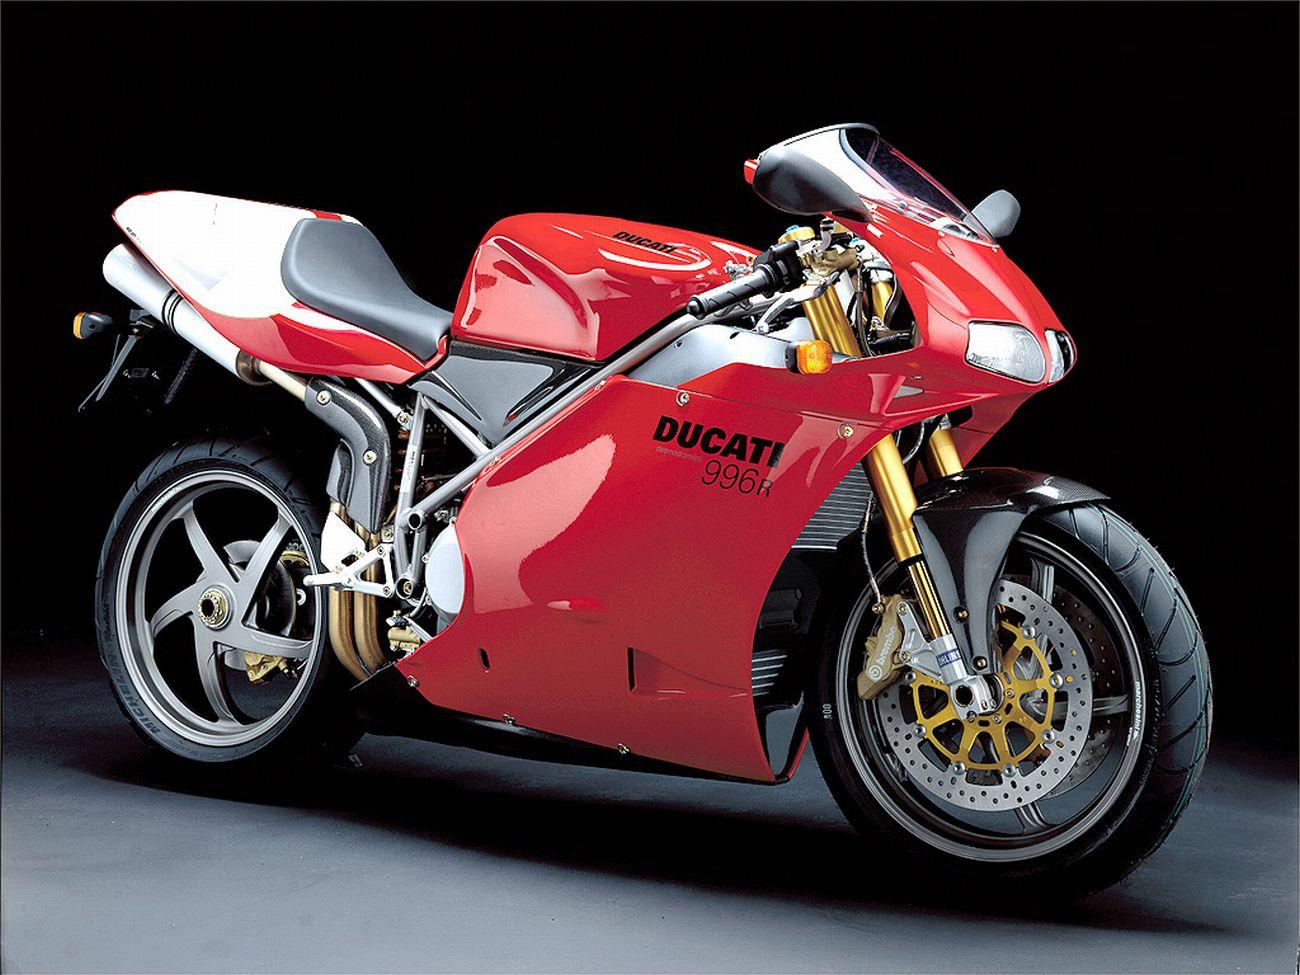 DUCATI 996 R engine